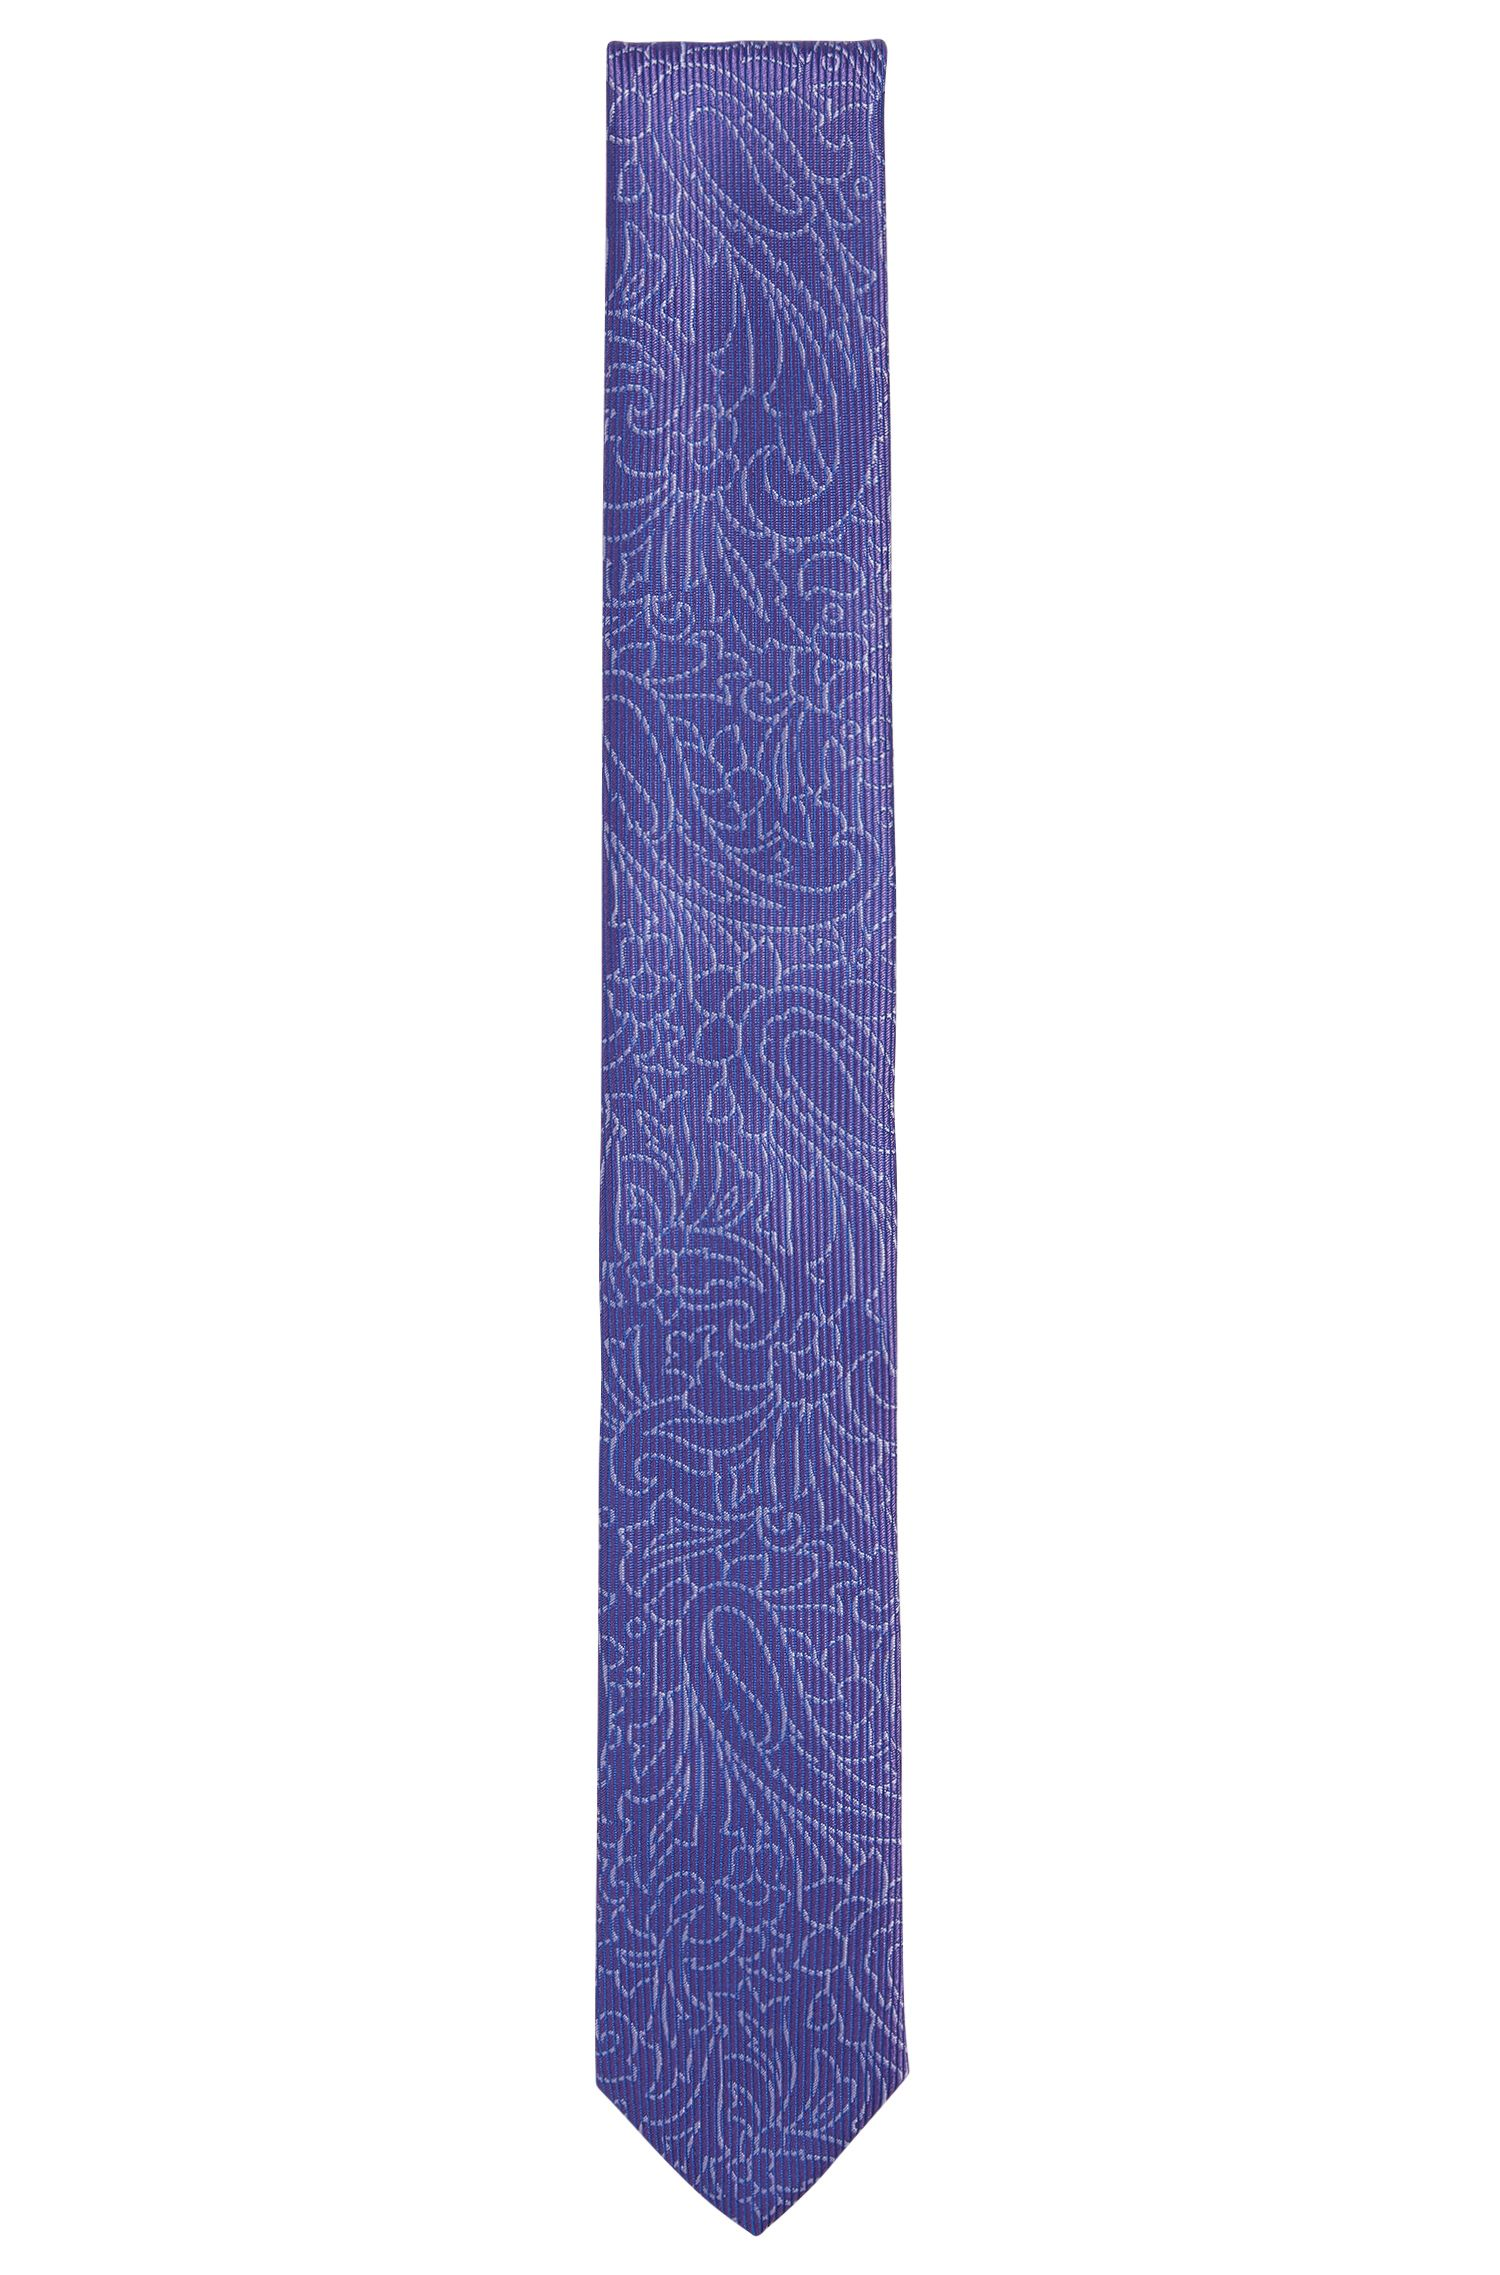 Jacquard Embroidered Italian Silk Slim Tie, Purple